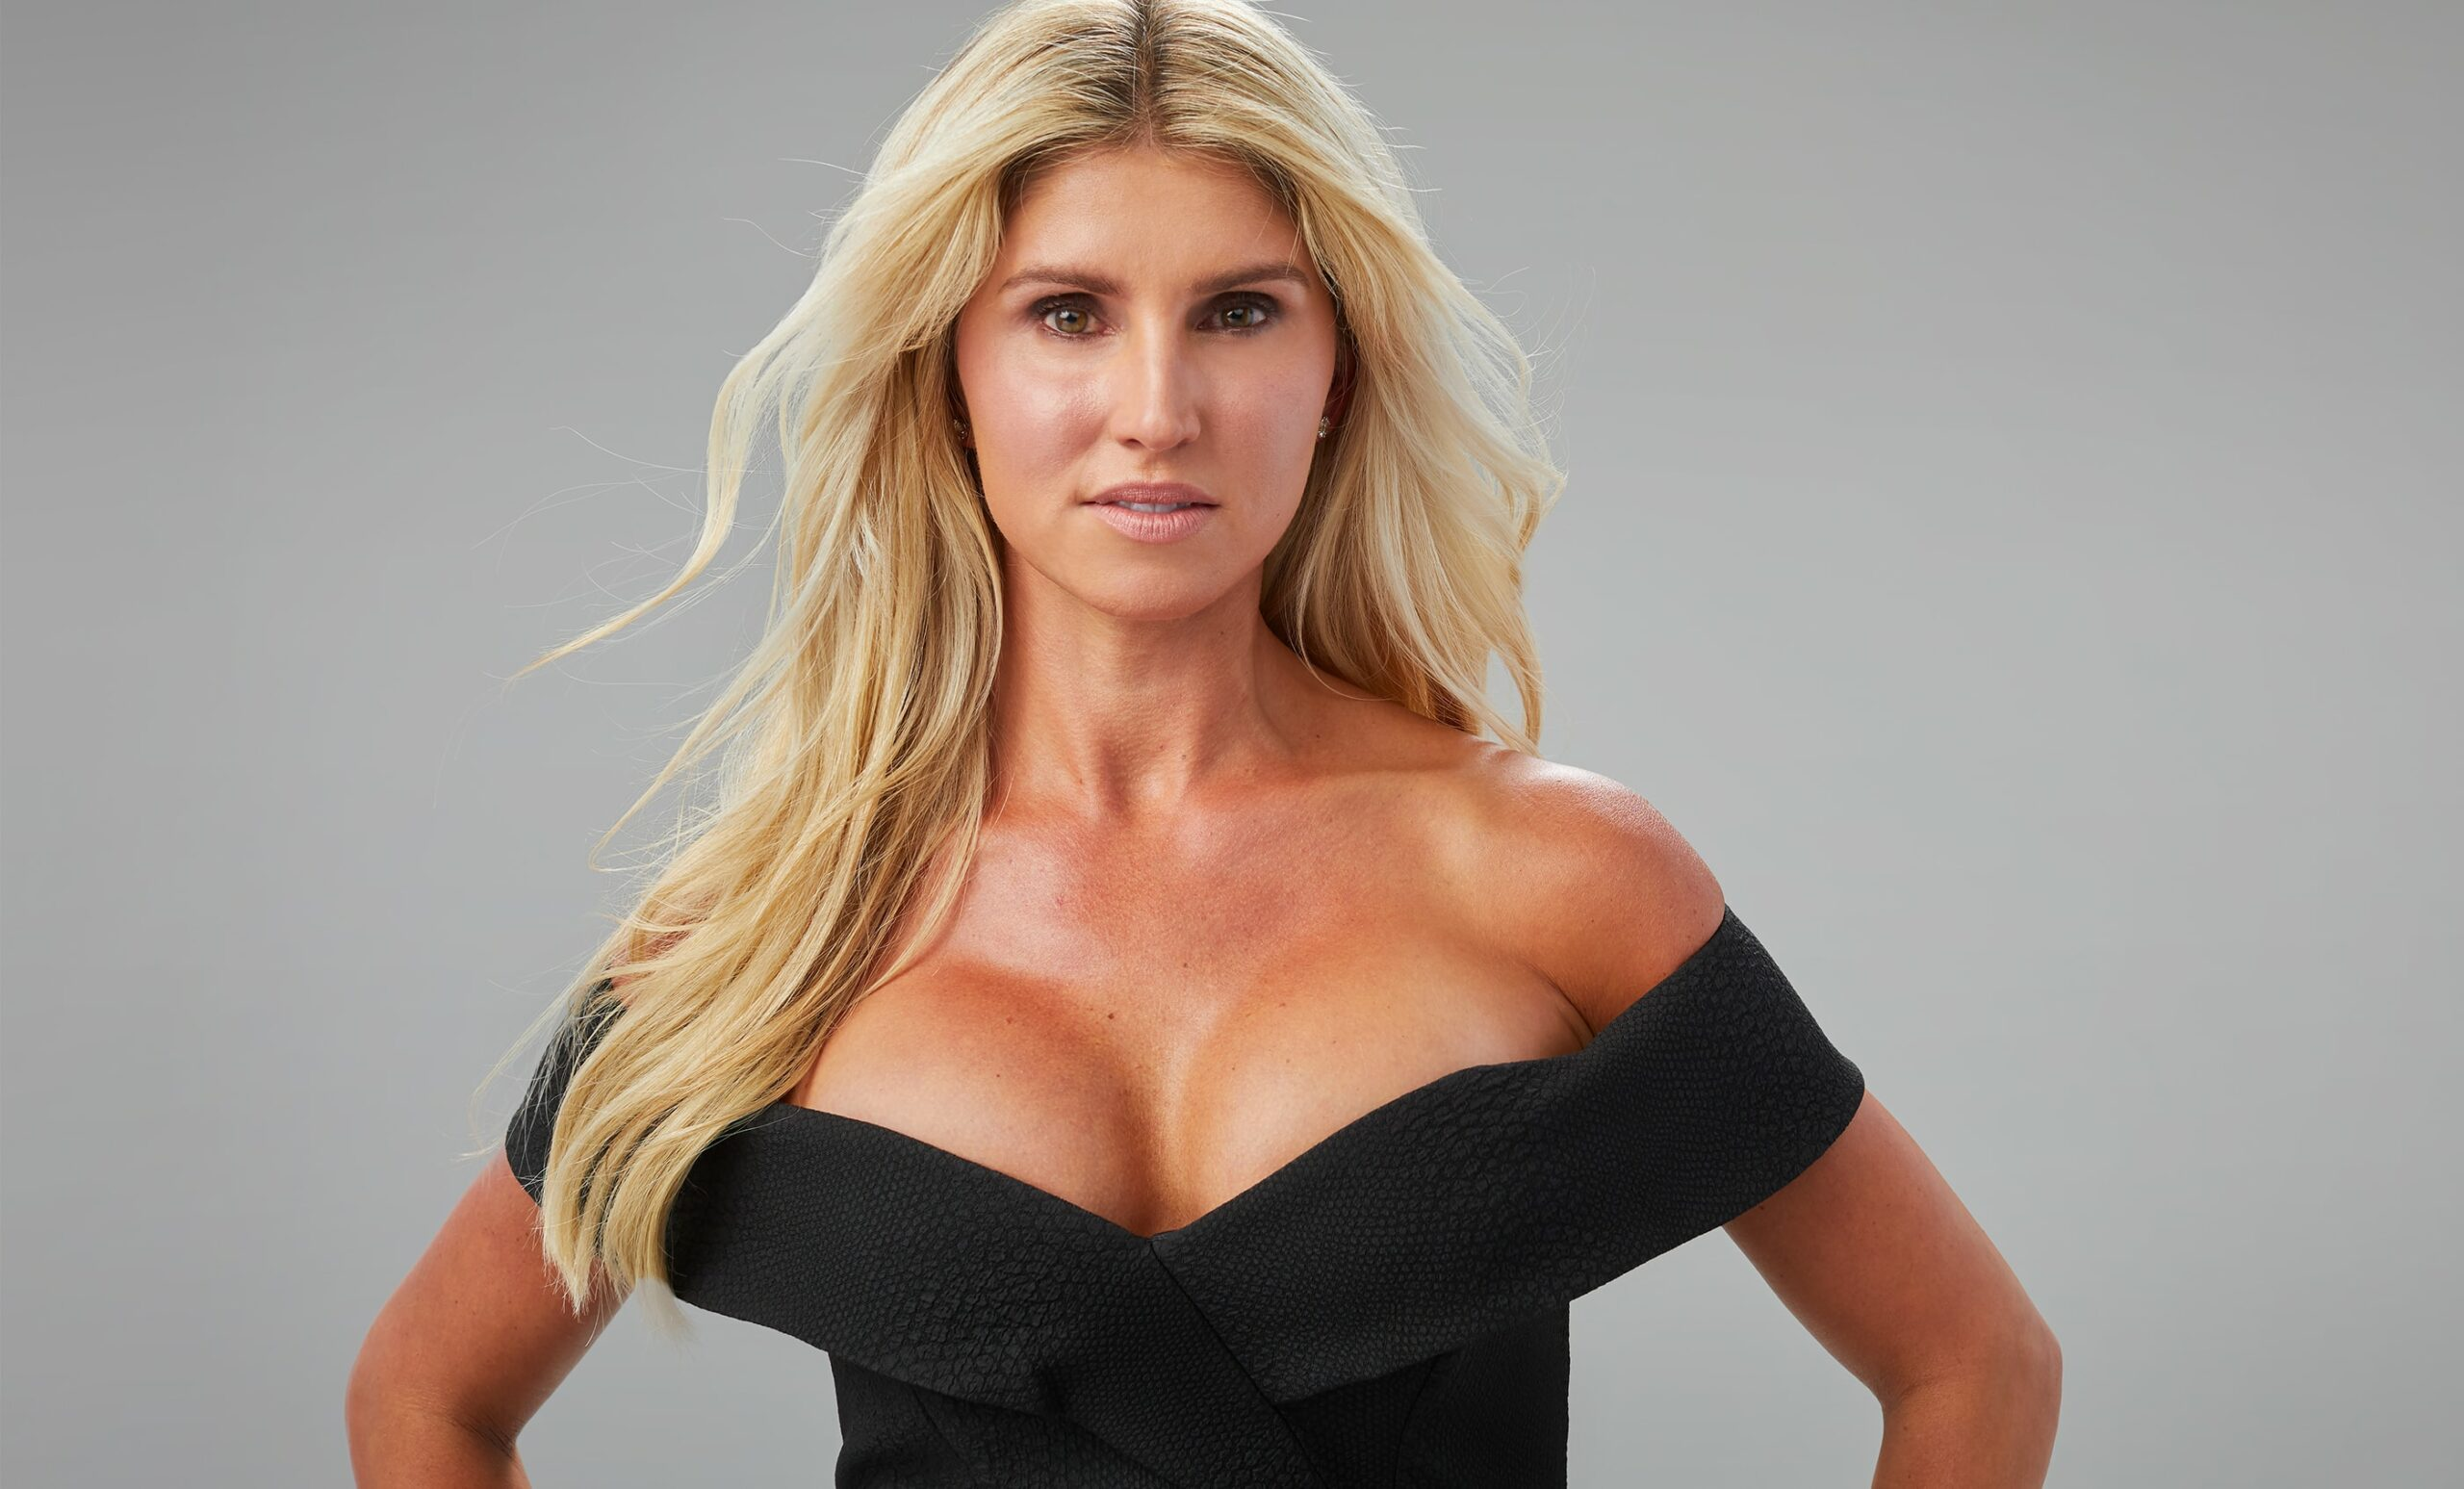 Esprit Patient Photo of Stephanie in Black